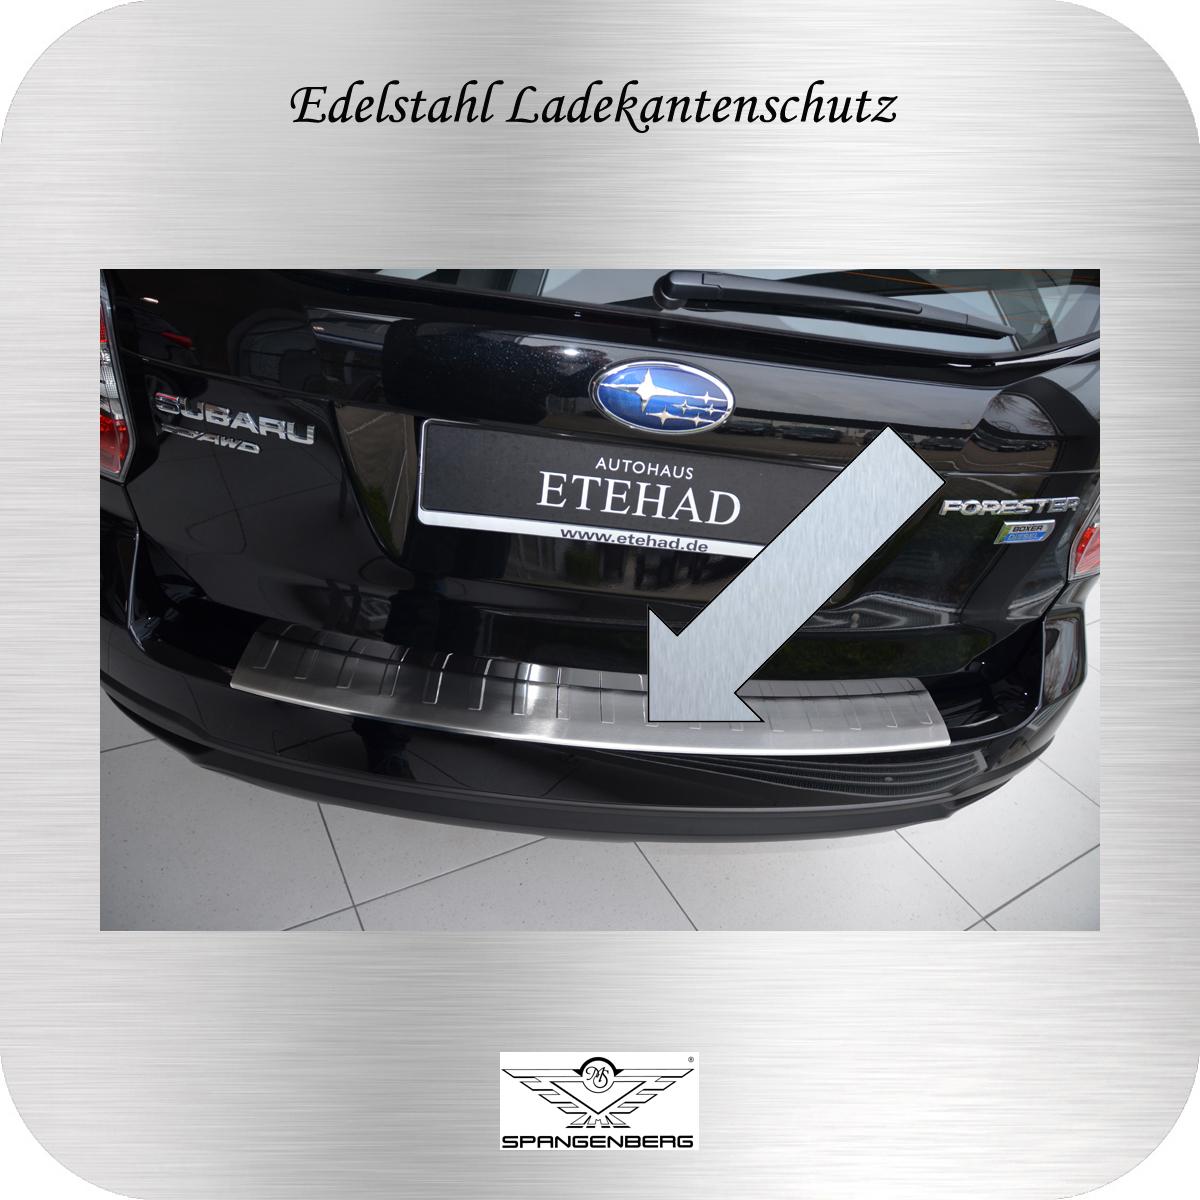 Ladekantenschutz Edelstahl Subaru Forester IV SUV Kombi Typ SJ 2013- 3235800